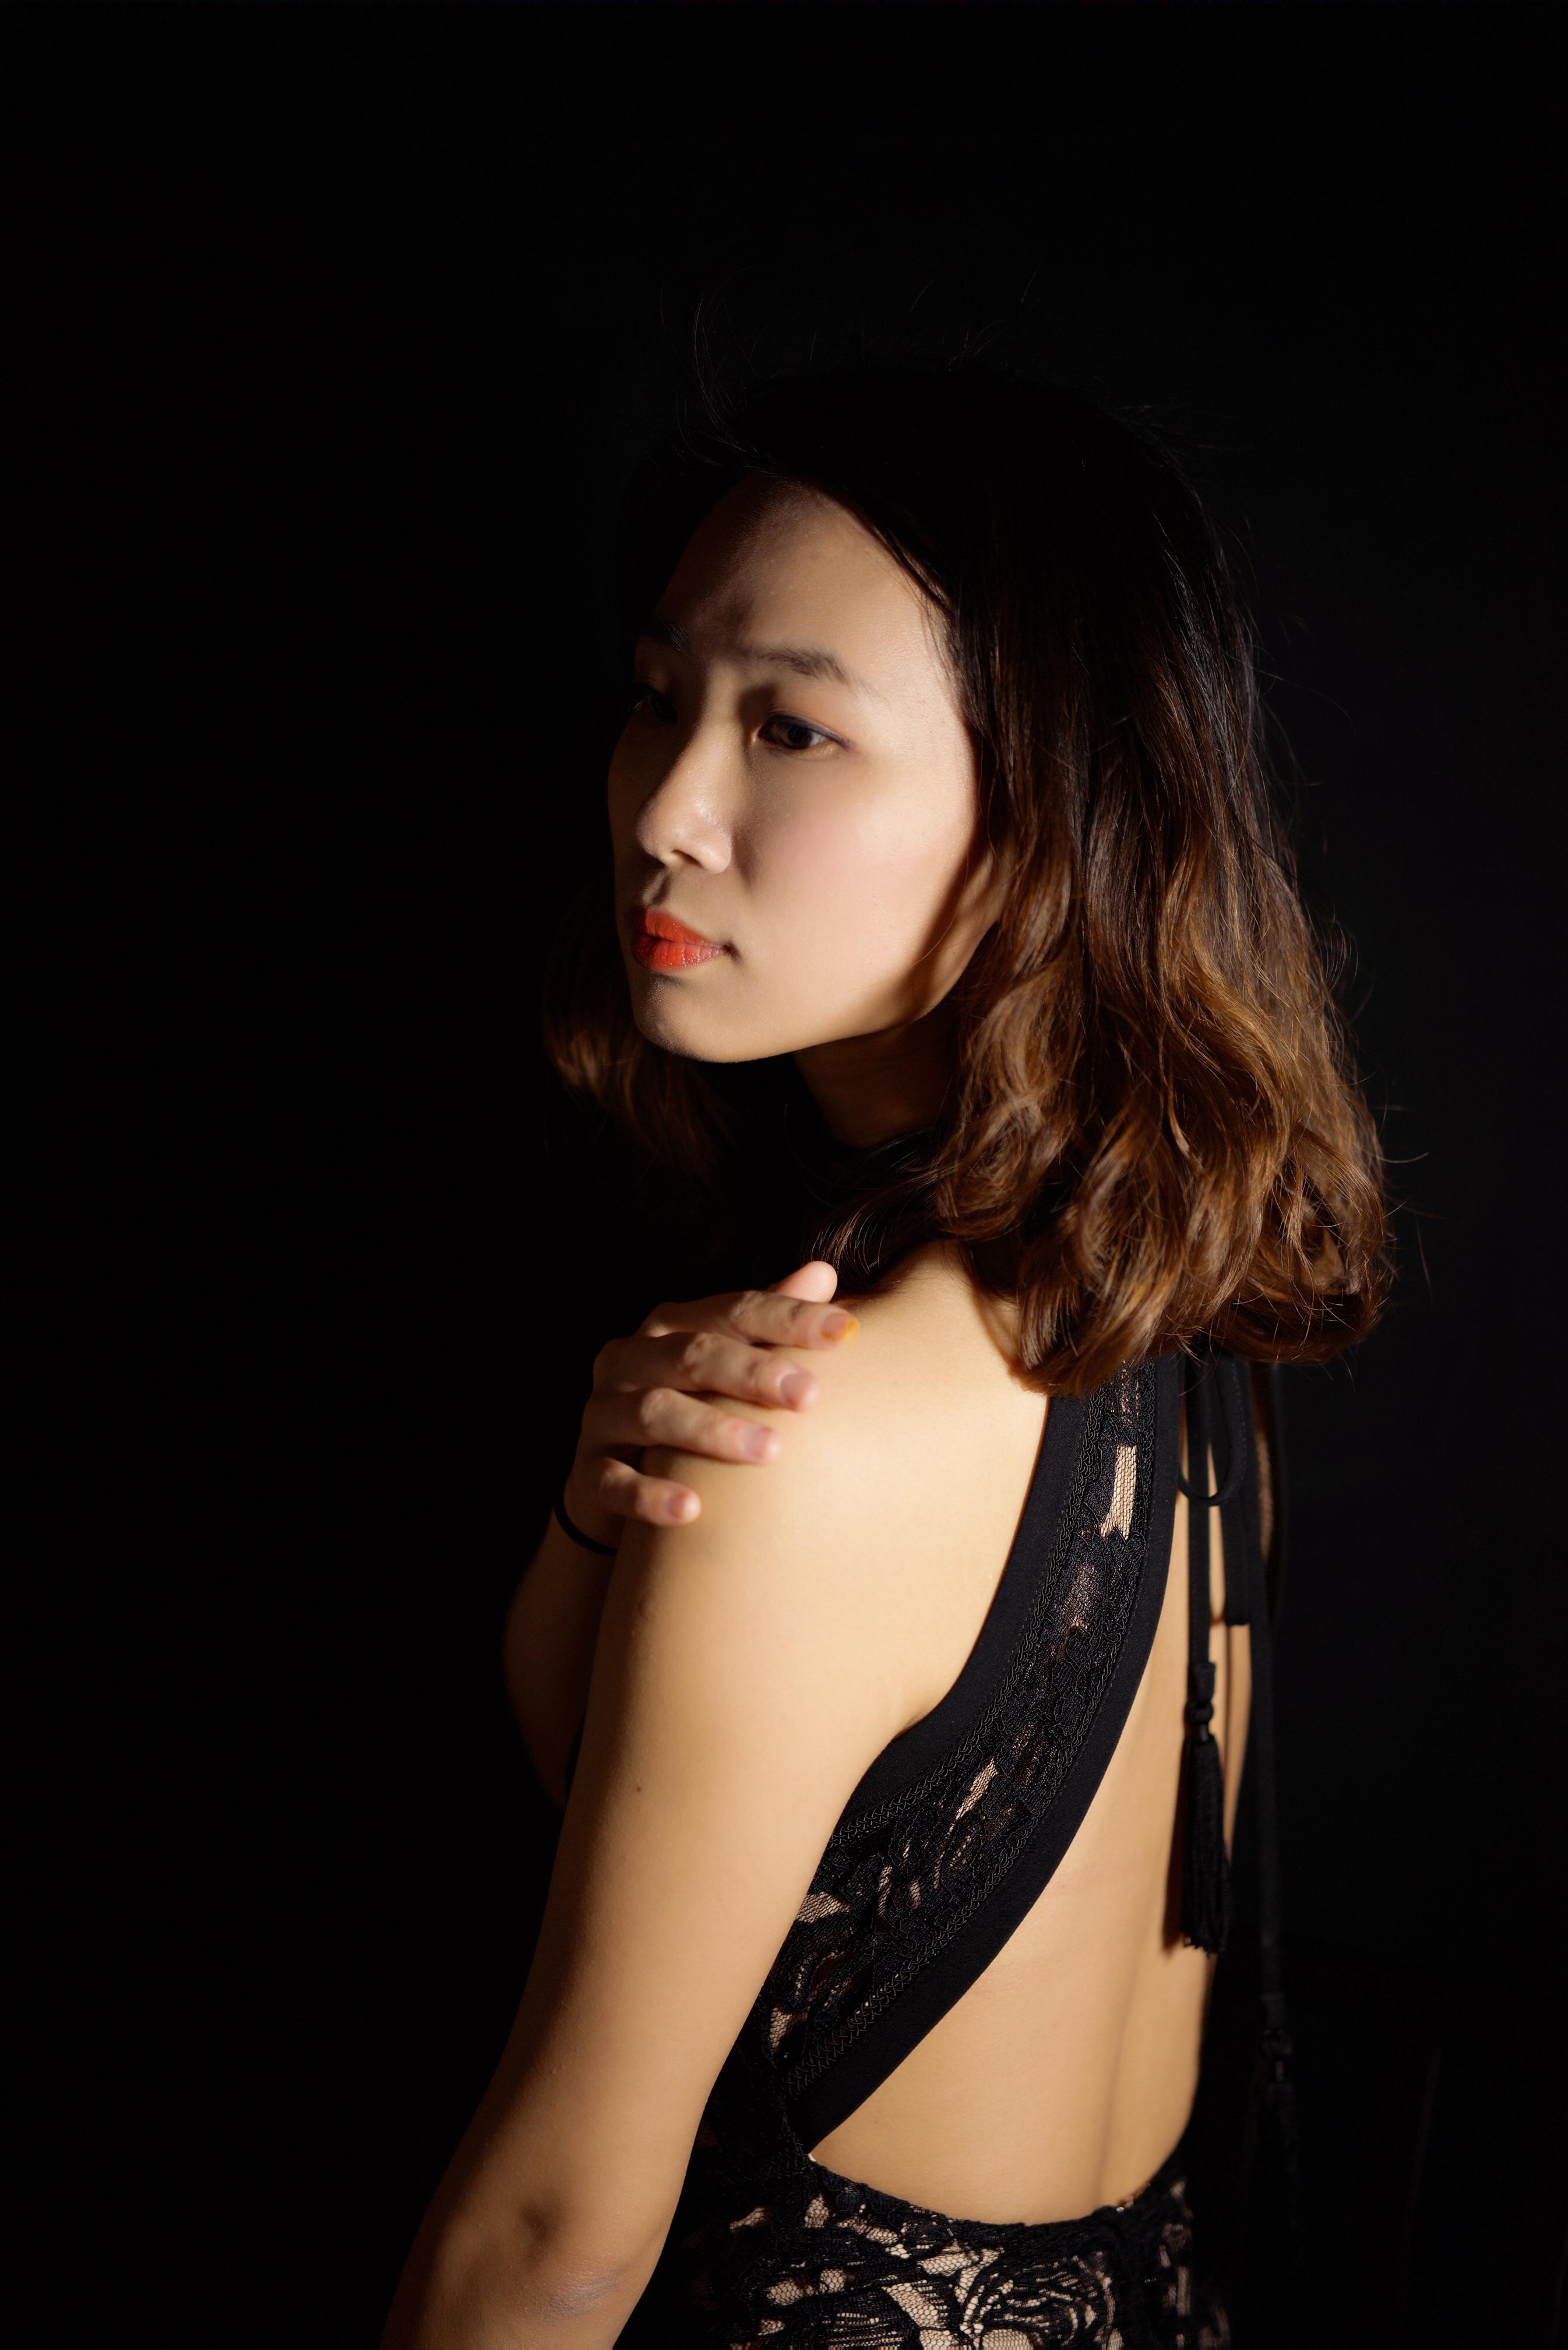 Le Zhan, Pianist